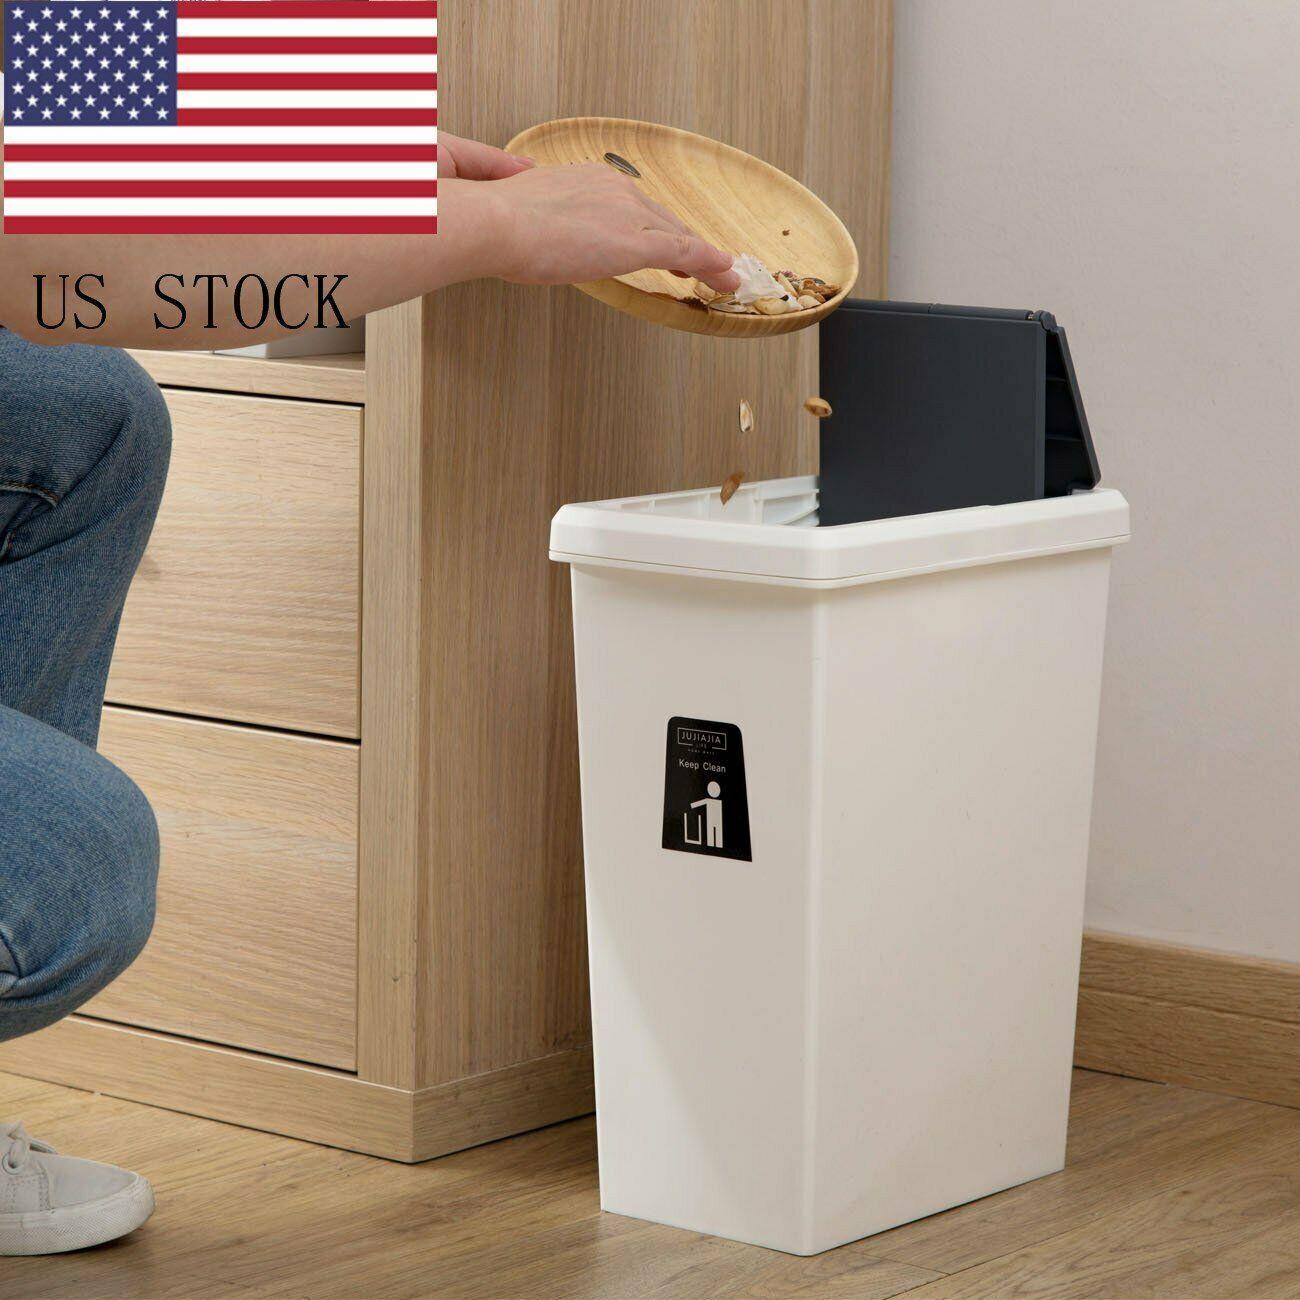 Garbage Can Garbage Can Ideas Garbage Can Garbagecan Home